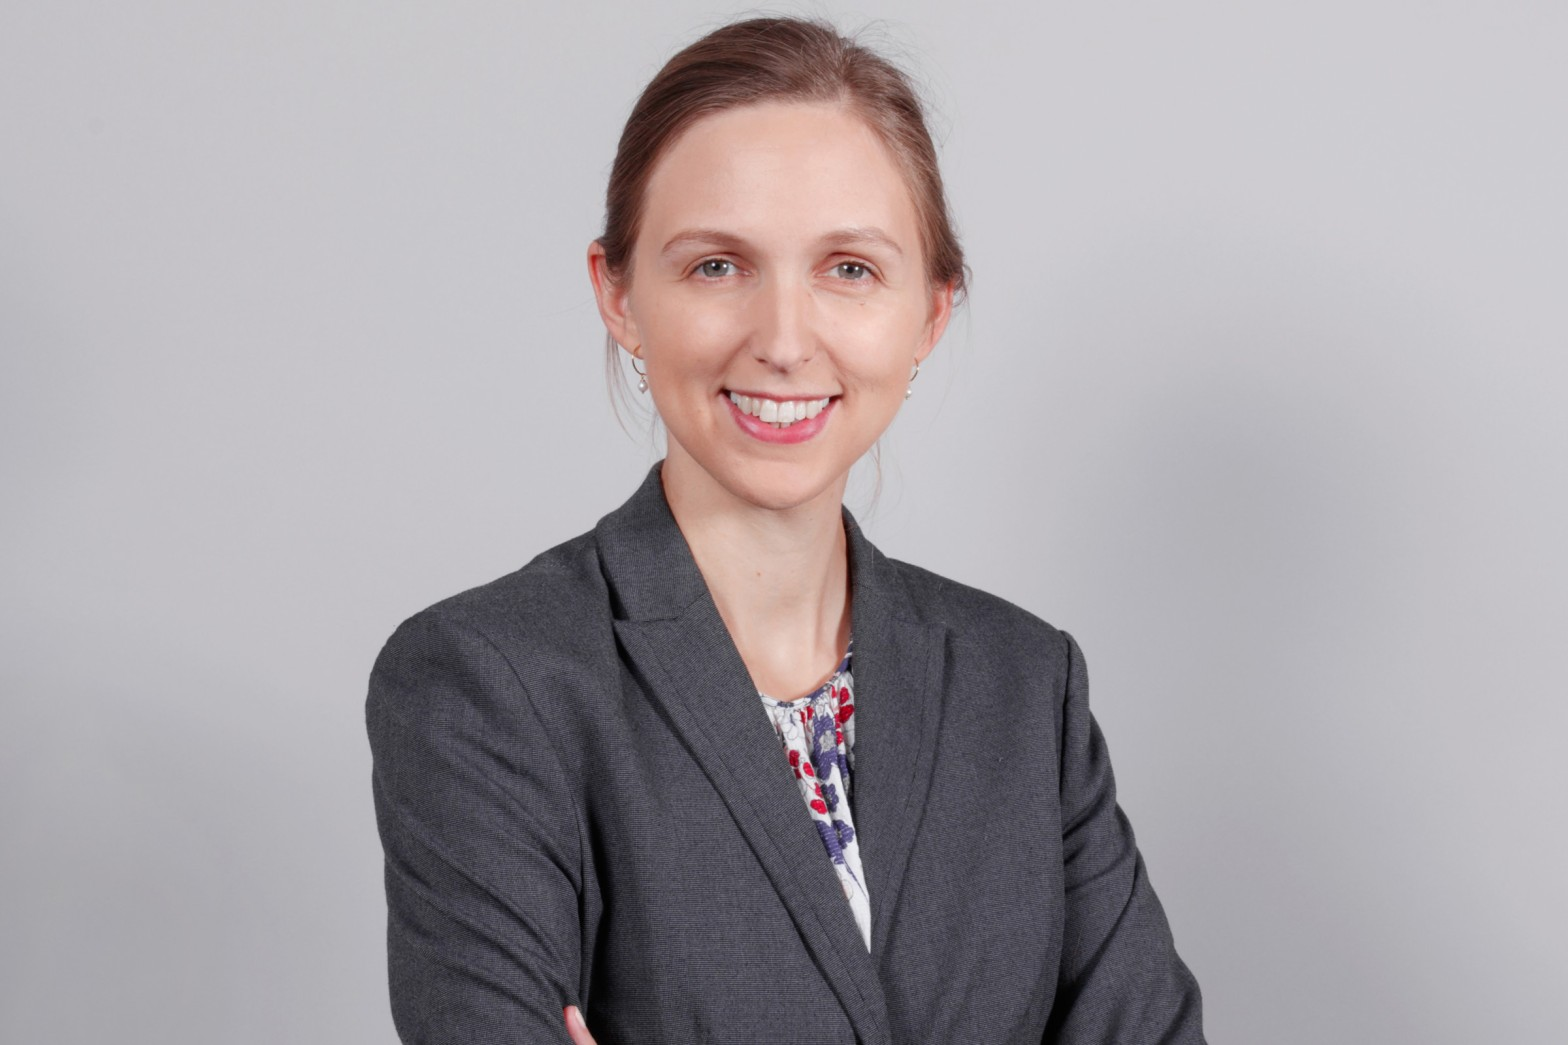 Portraitfoto von Christine Otte, China-Expertin von Germany Trade and Invest.